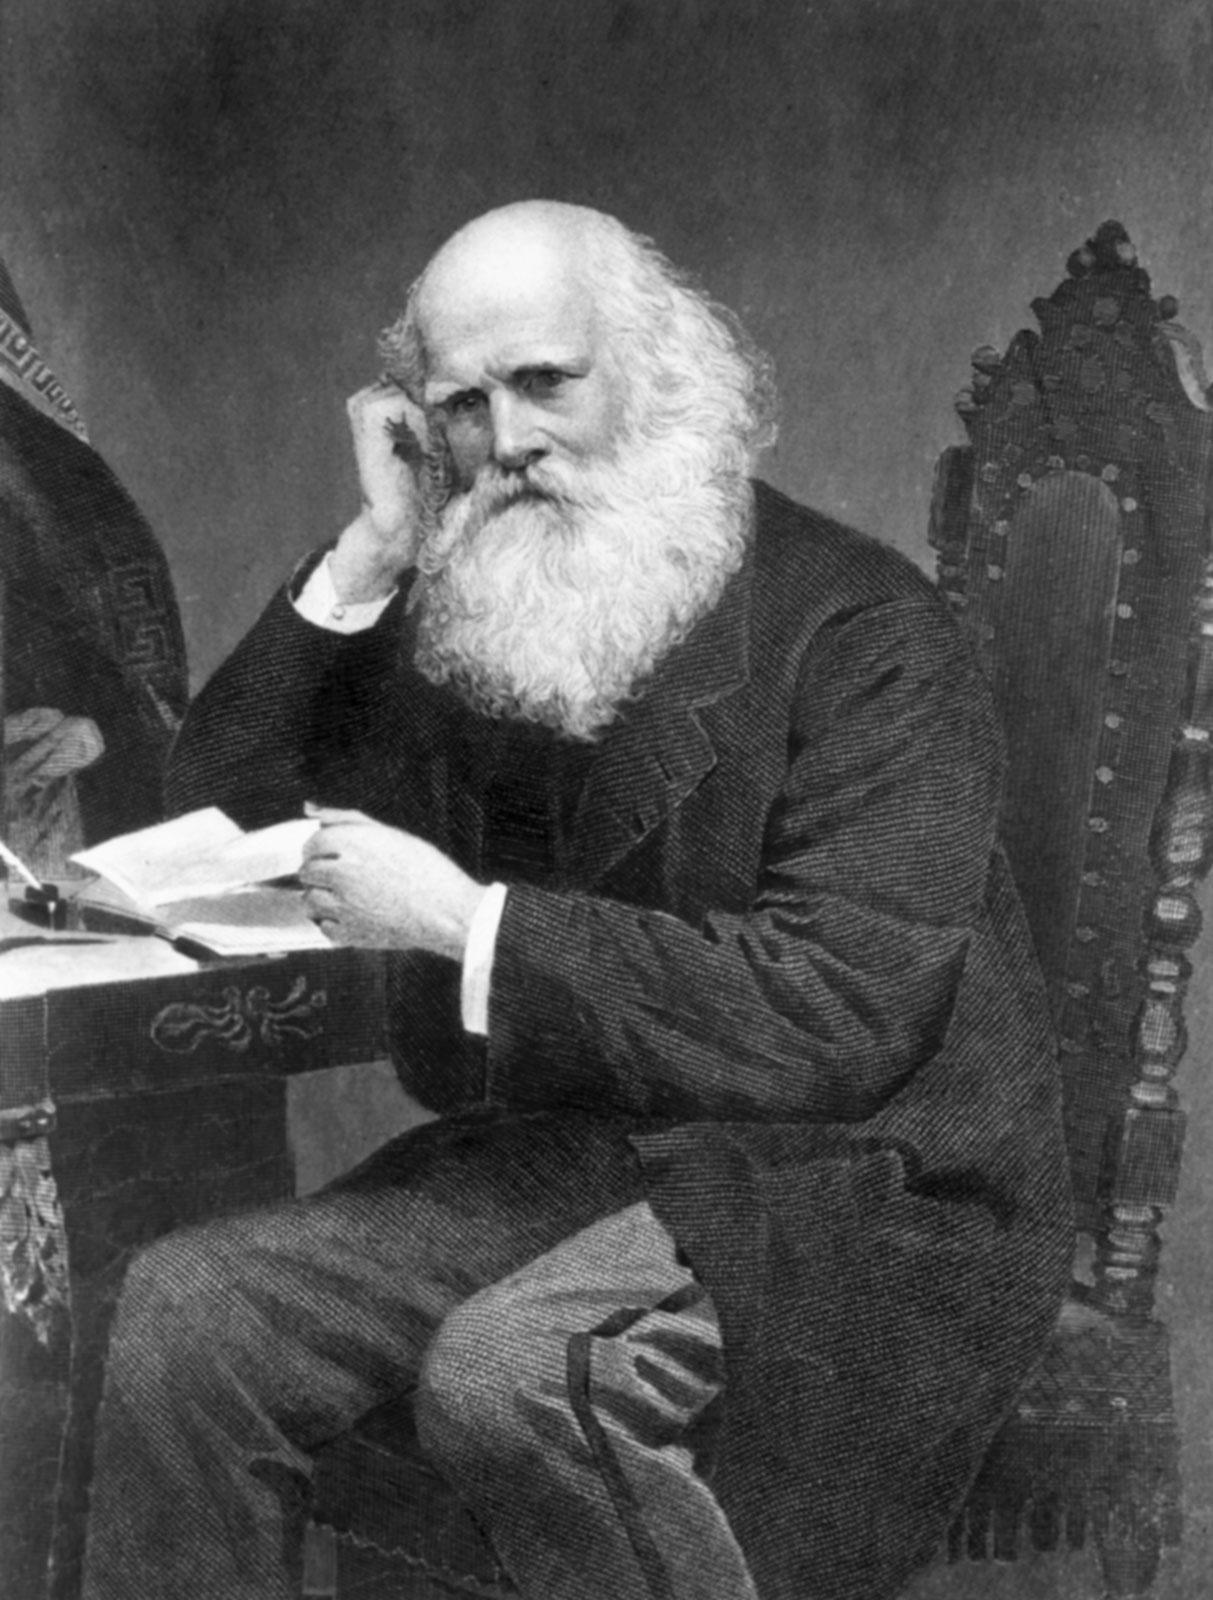 Facial hair, Hand, Sitting, Beard